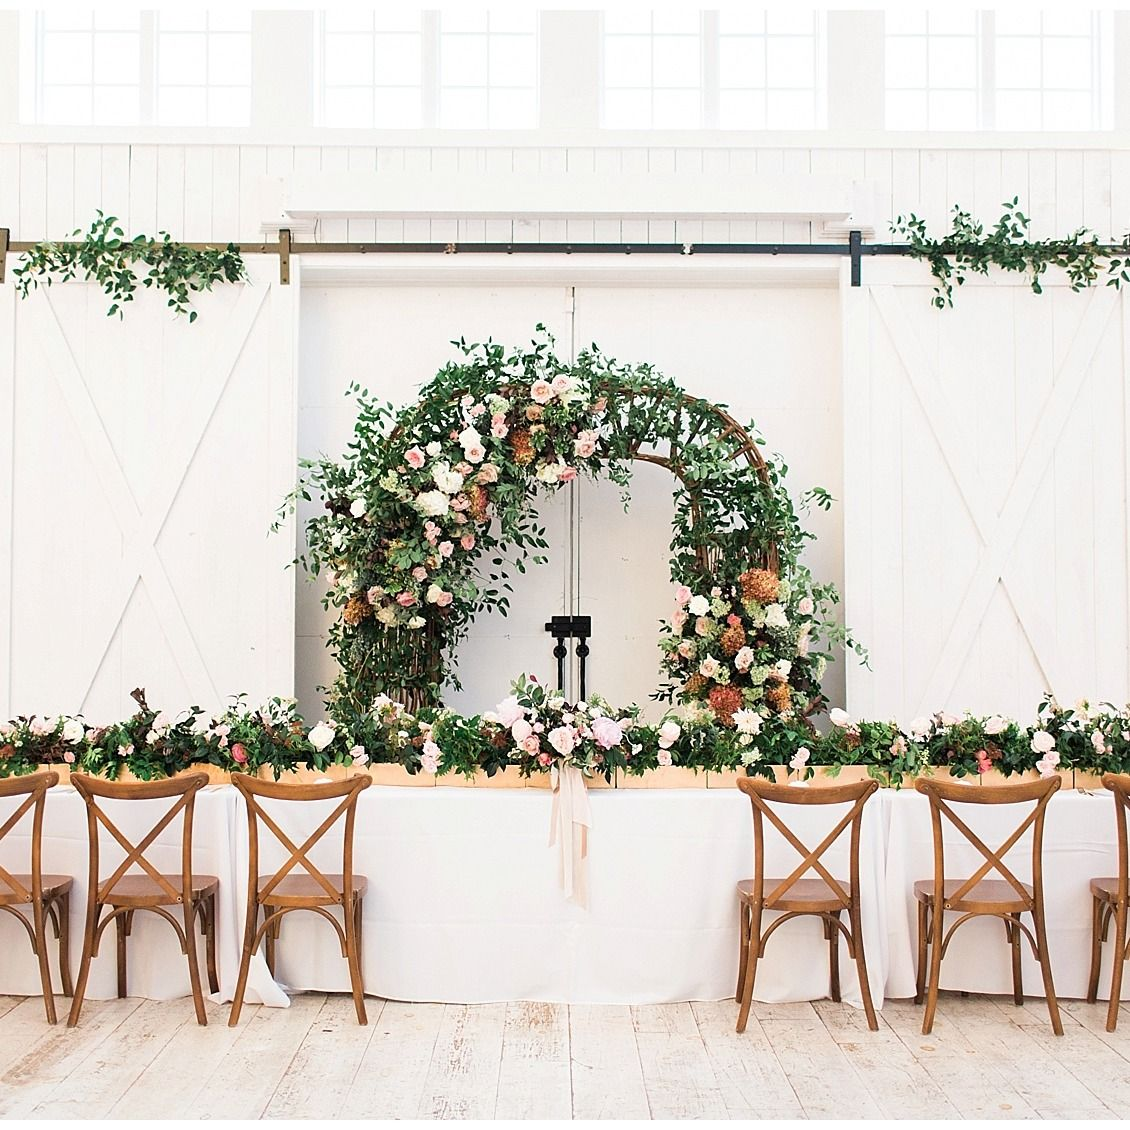 Event Design | Wedding venues texas, Barn wedding venues texas